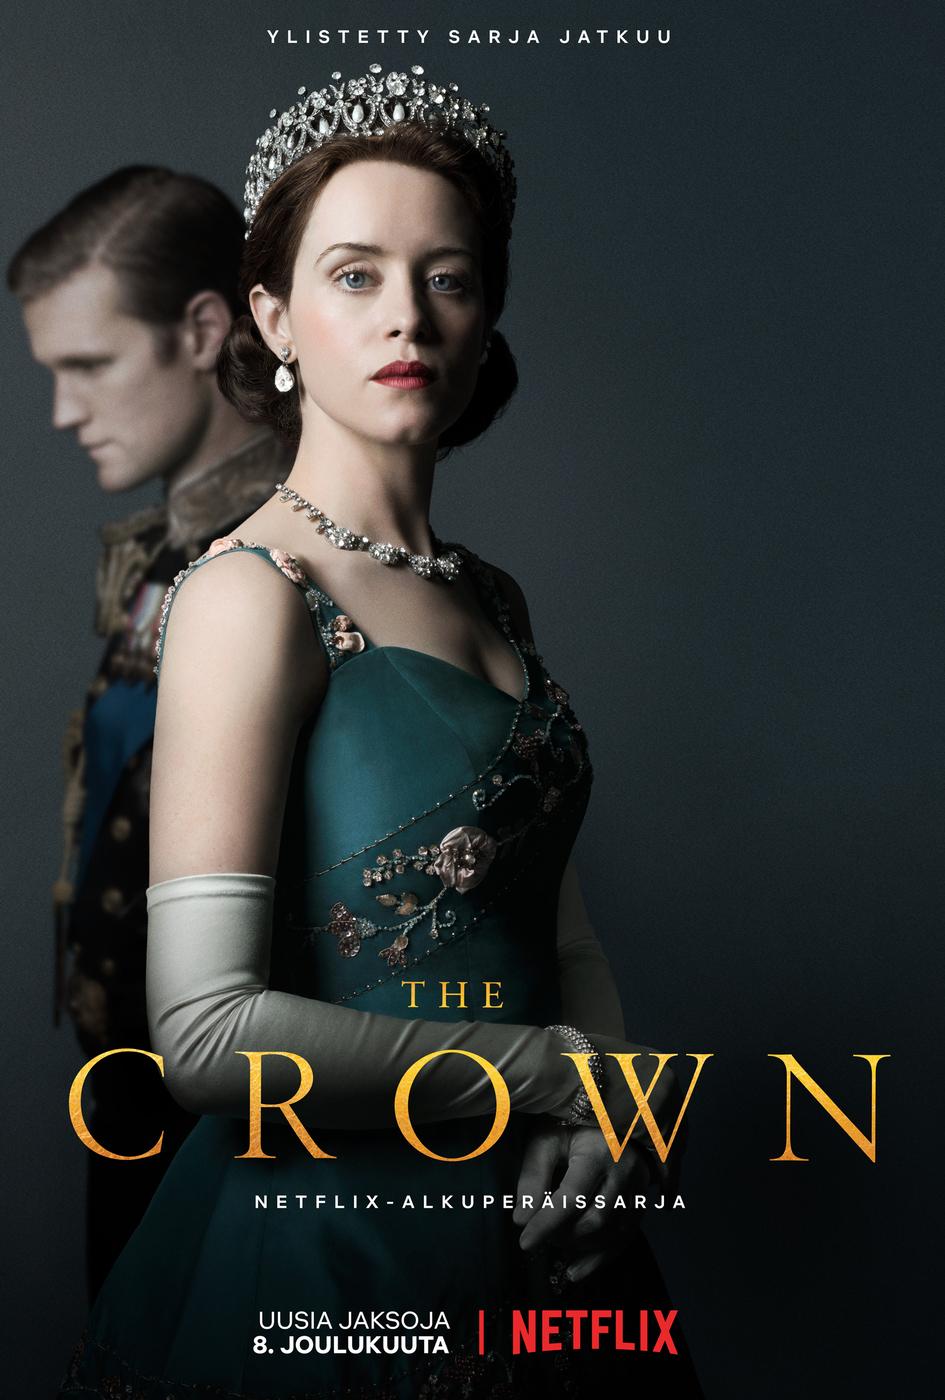 The Crown jatkuu: Kuningatar Elisabet II 60-luvulla